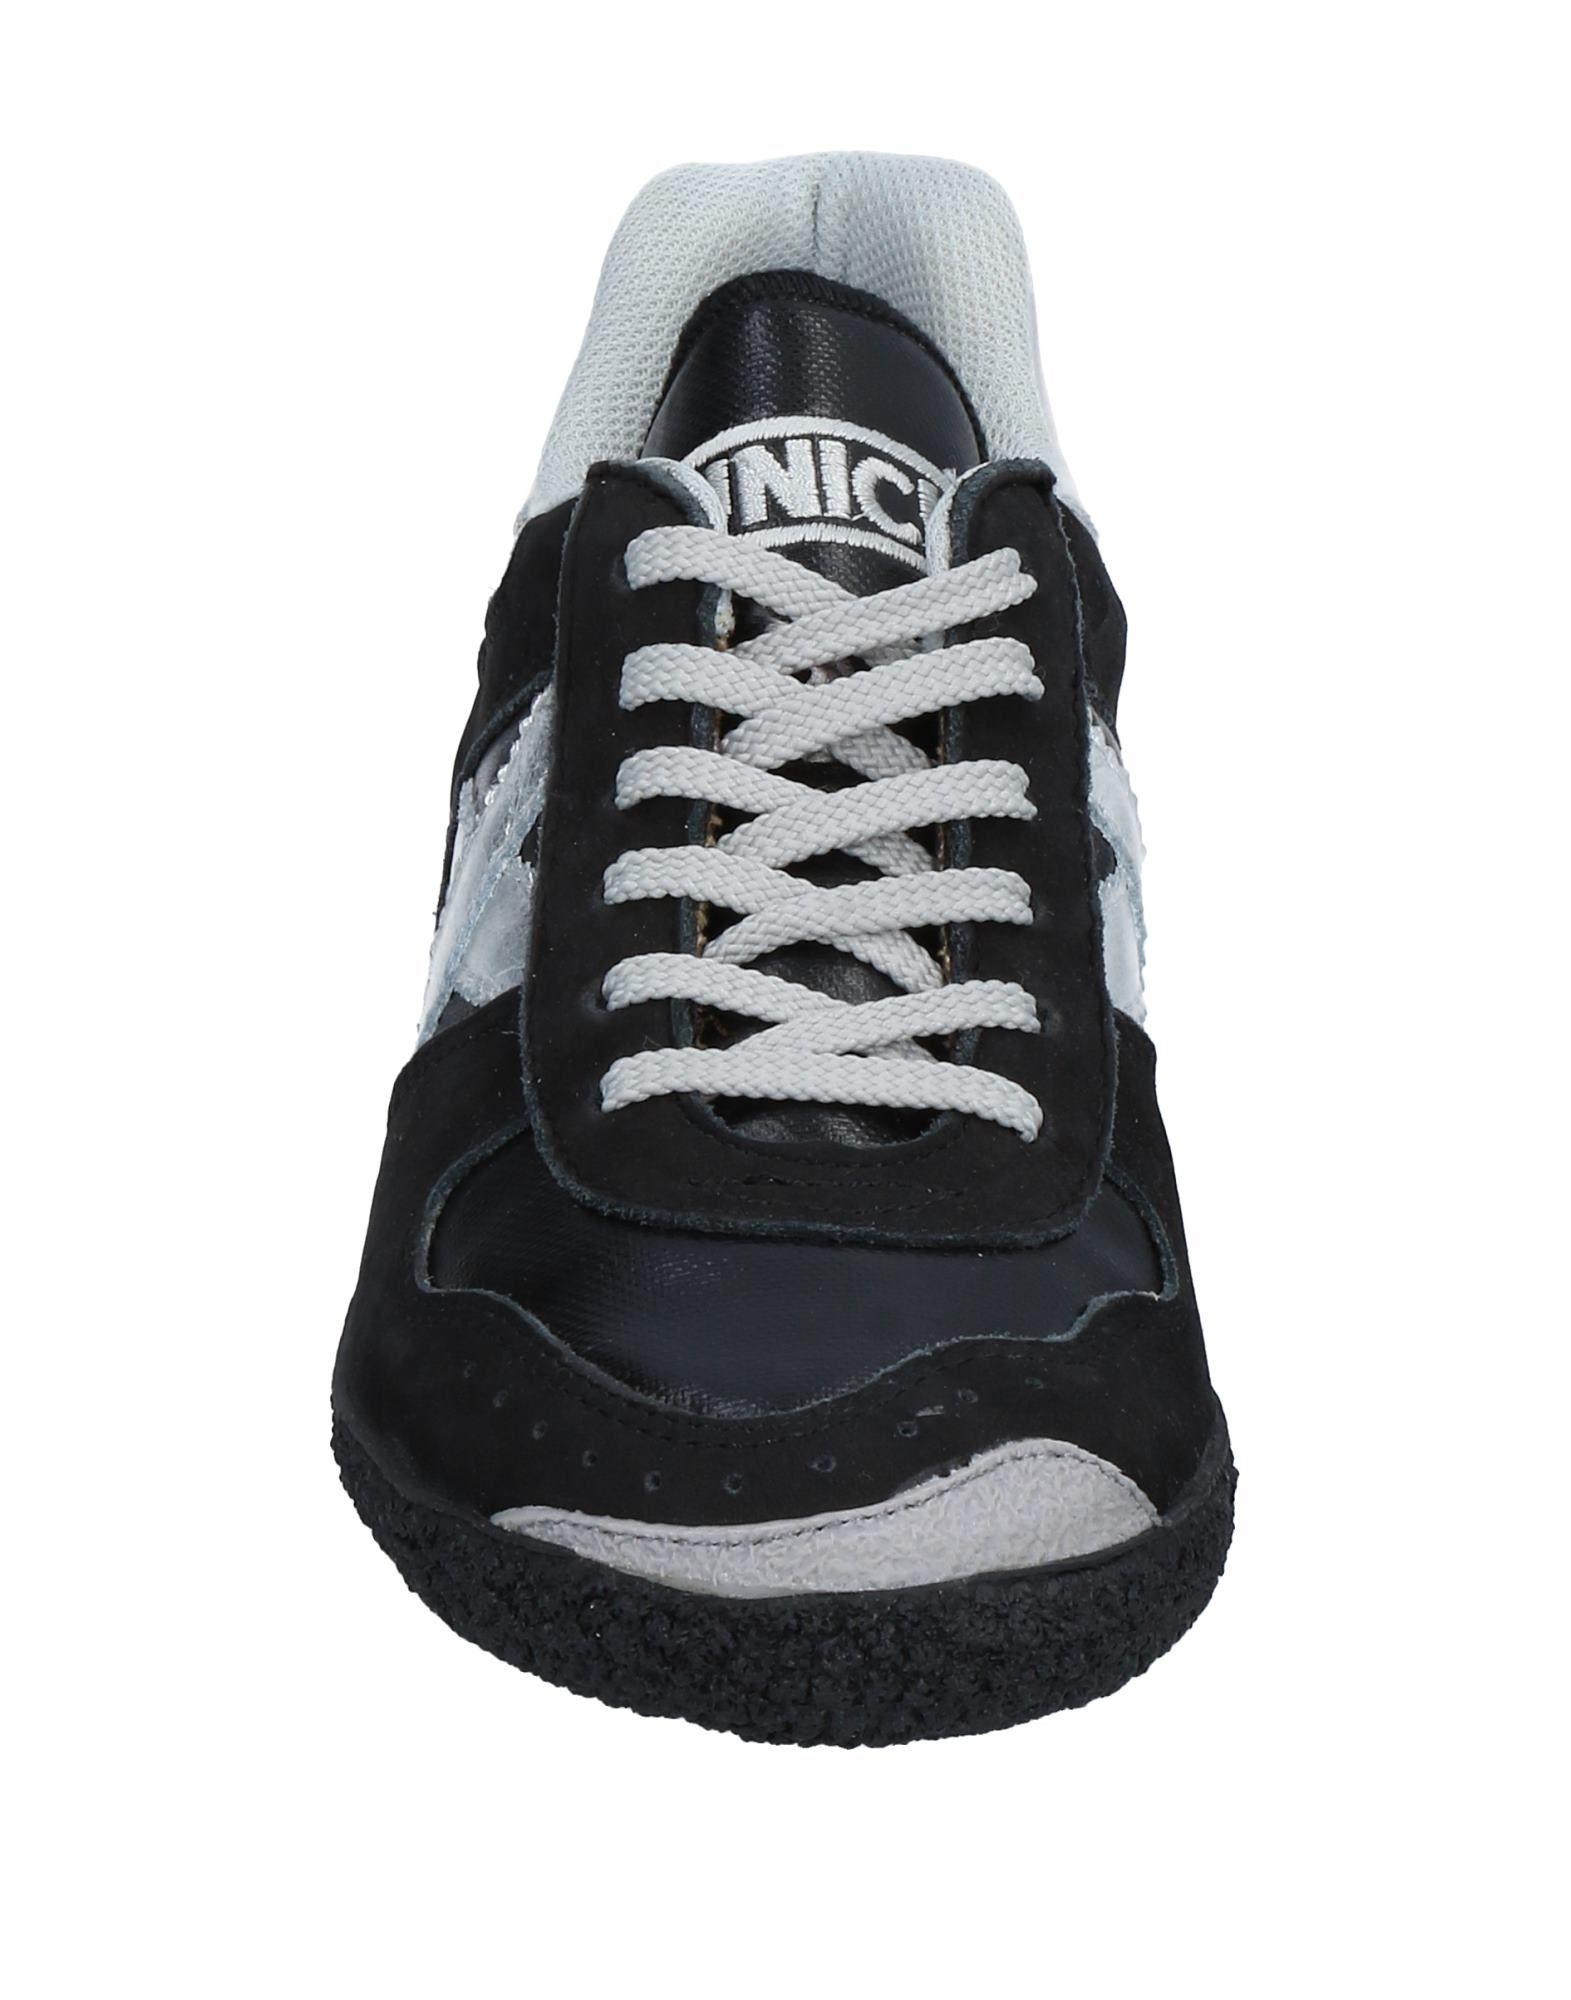 Munich Sneakers Damen Qualität  11530732GB Gute Qualität Damen beliebte Schuhe e7c3c3